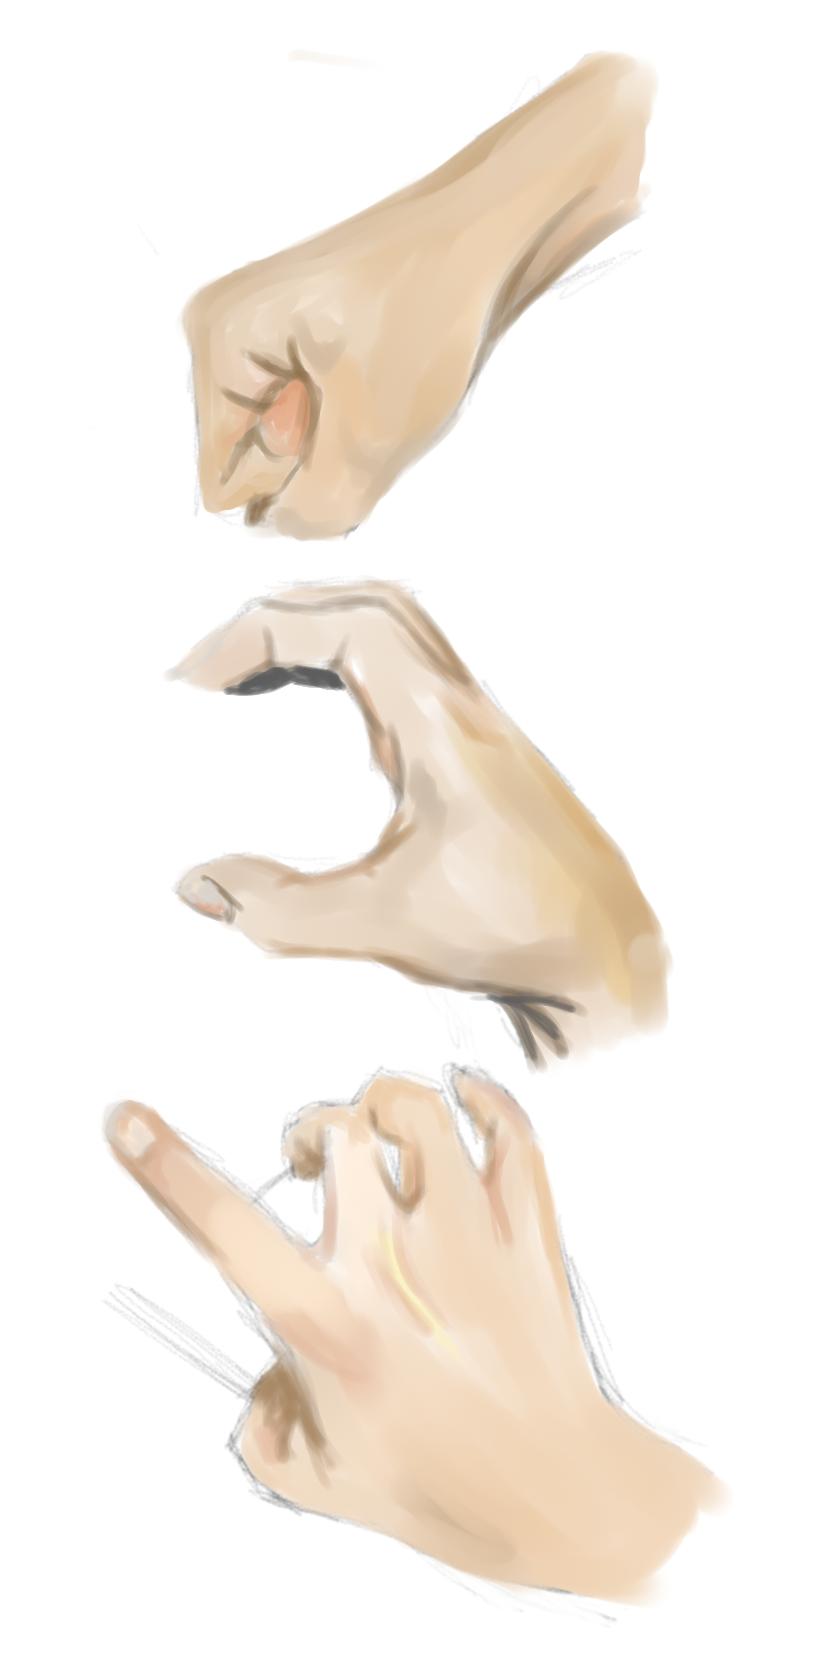 [Image: hands_by_timeandrelativedis-d6d0wem.png]